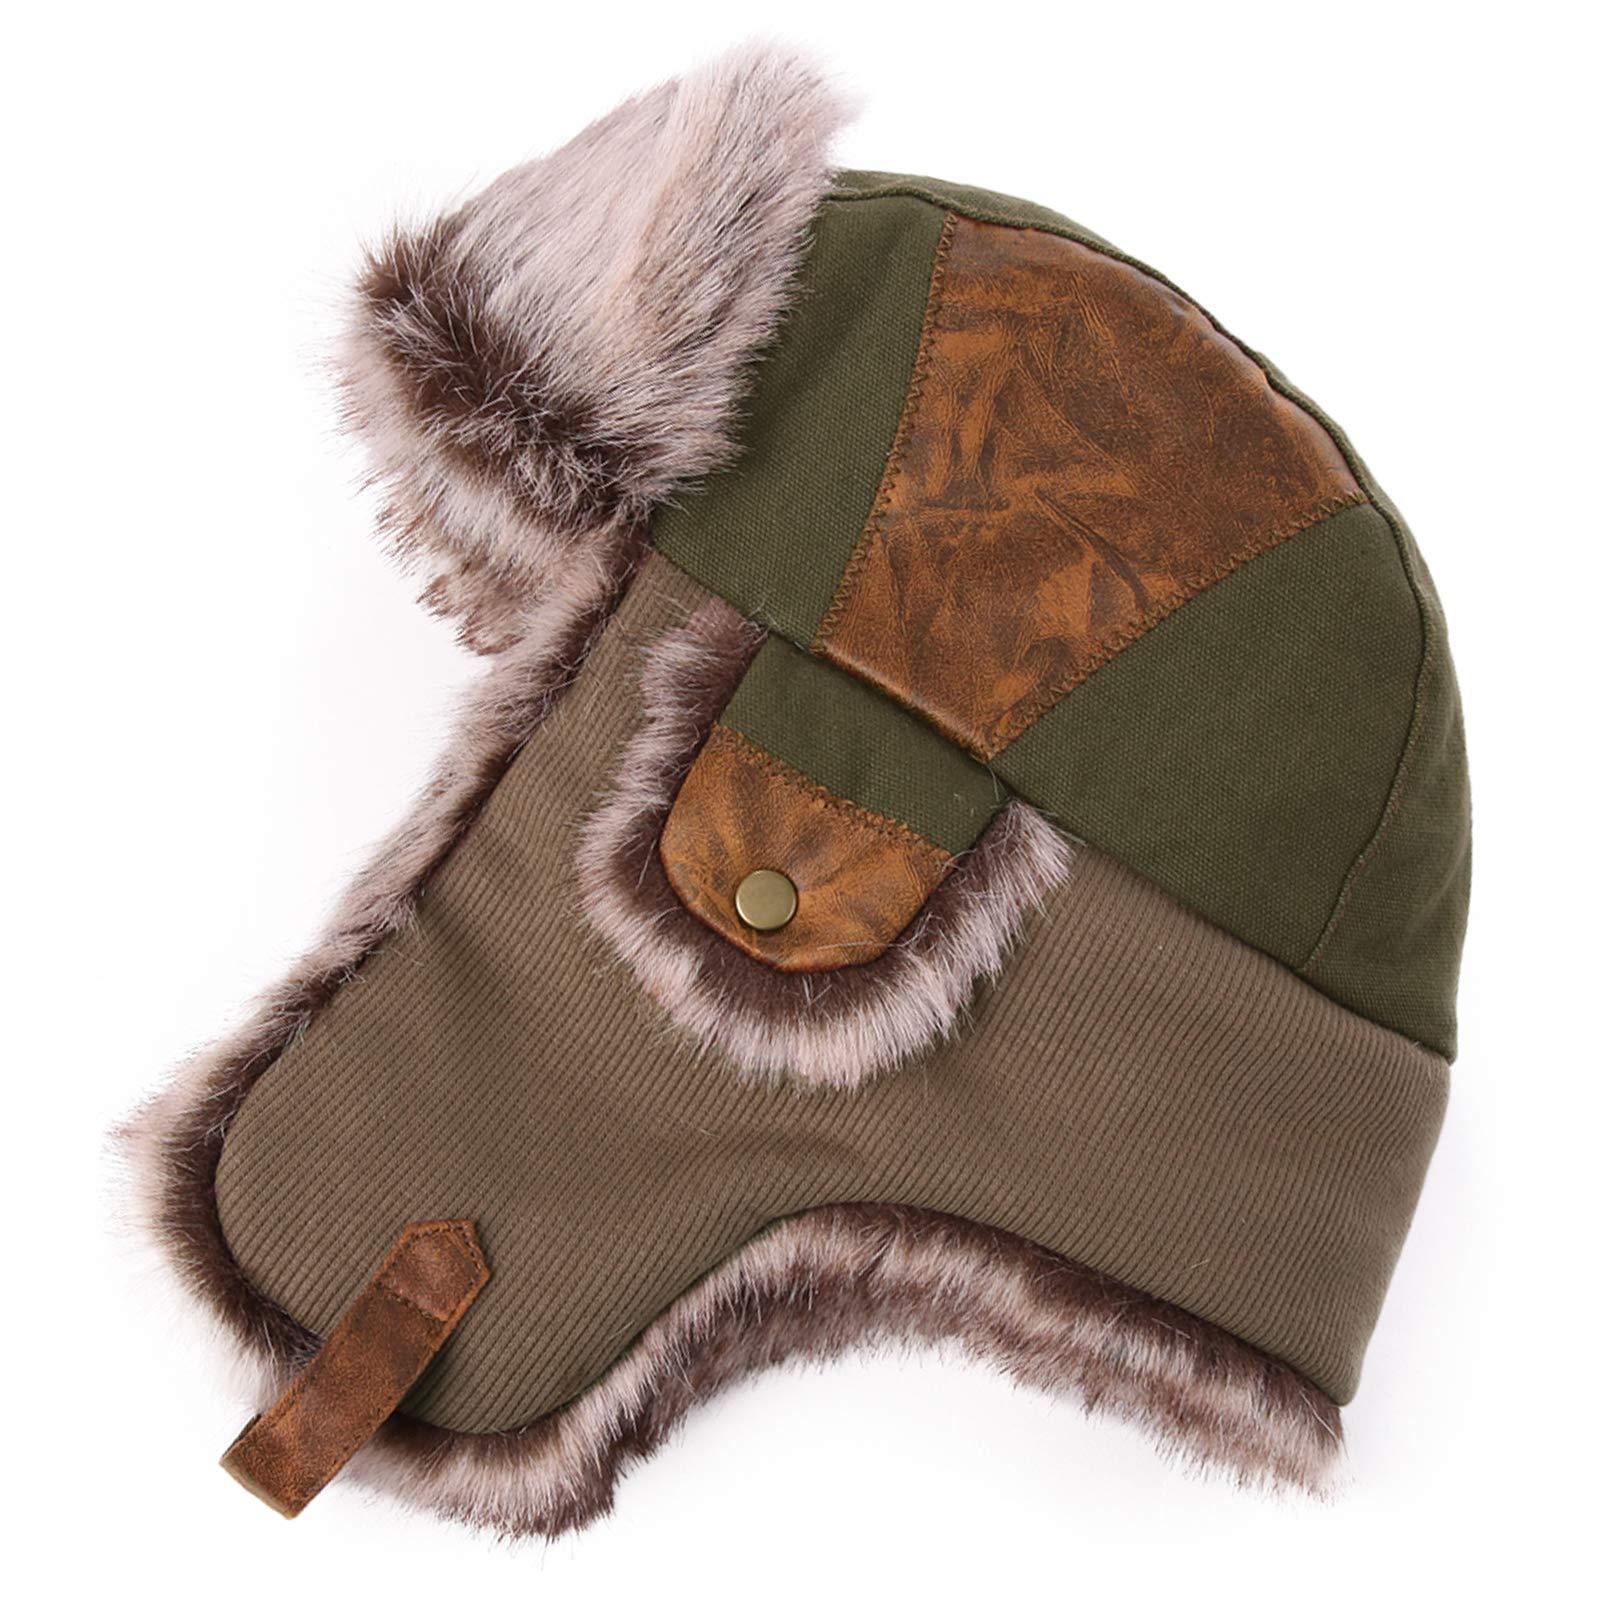 Fancet Winter Faux Fur Trapper Bomber Hat Men Women Warm Thermal Lined Outdoor Ski Snow Earflap Hunter Hats for Walking Skiing